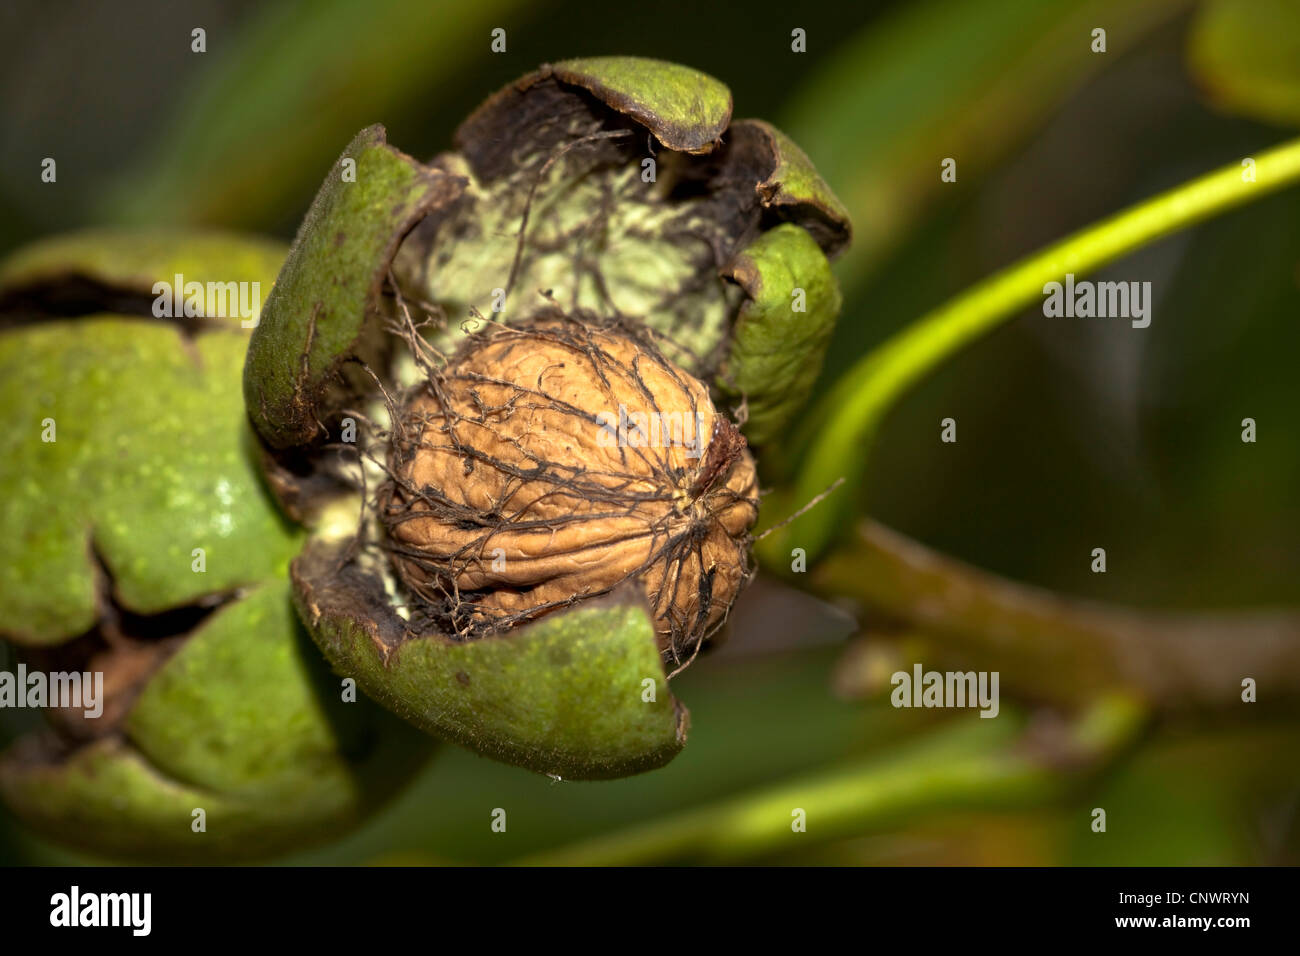 walnut (Juglans regia), ripe fruit with open husk, Germany, Bavaria - Stock Image